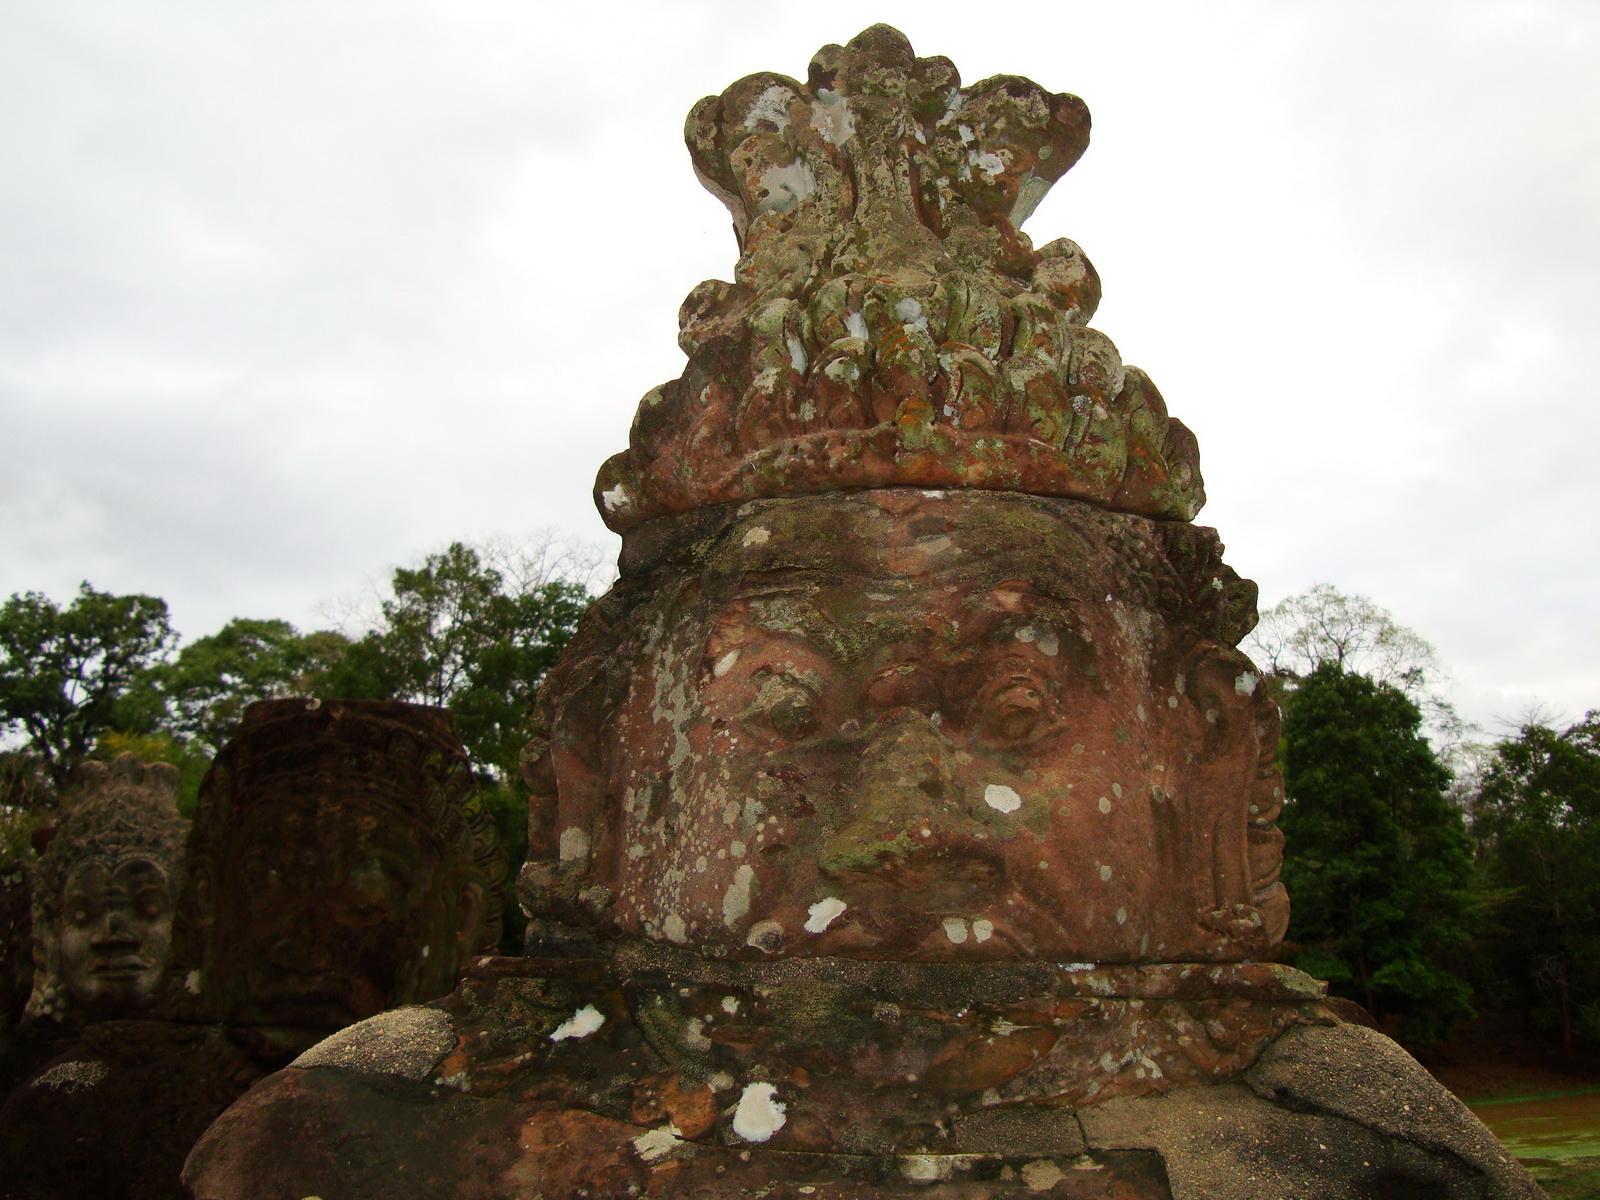 Asuras and Devas Statues on the South Gate bridge Jan 2010 12